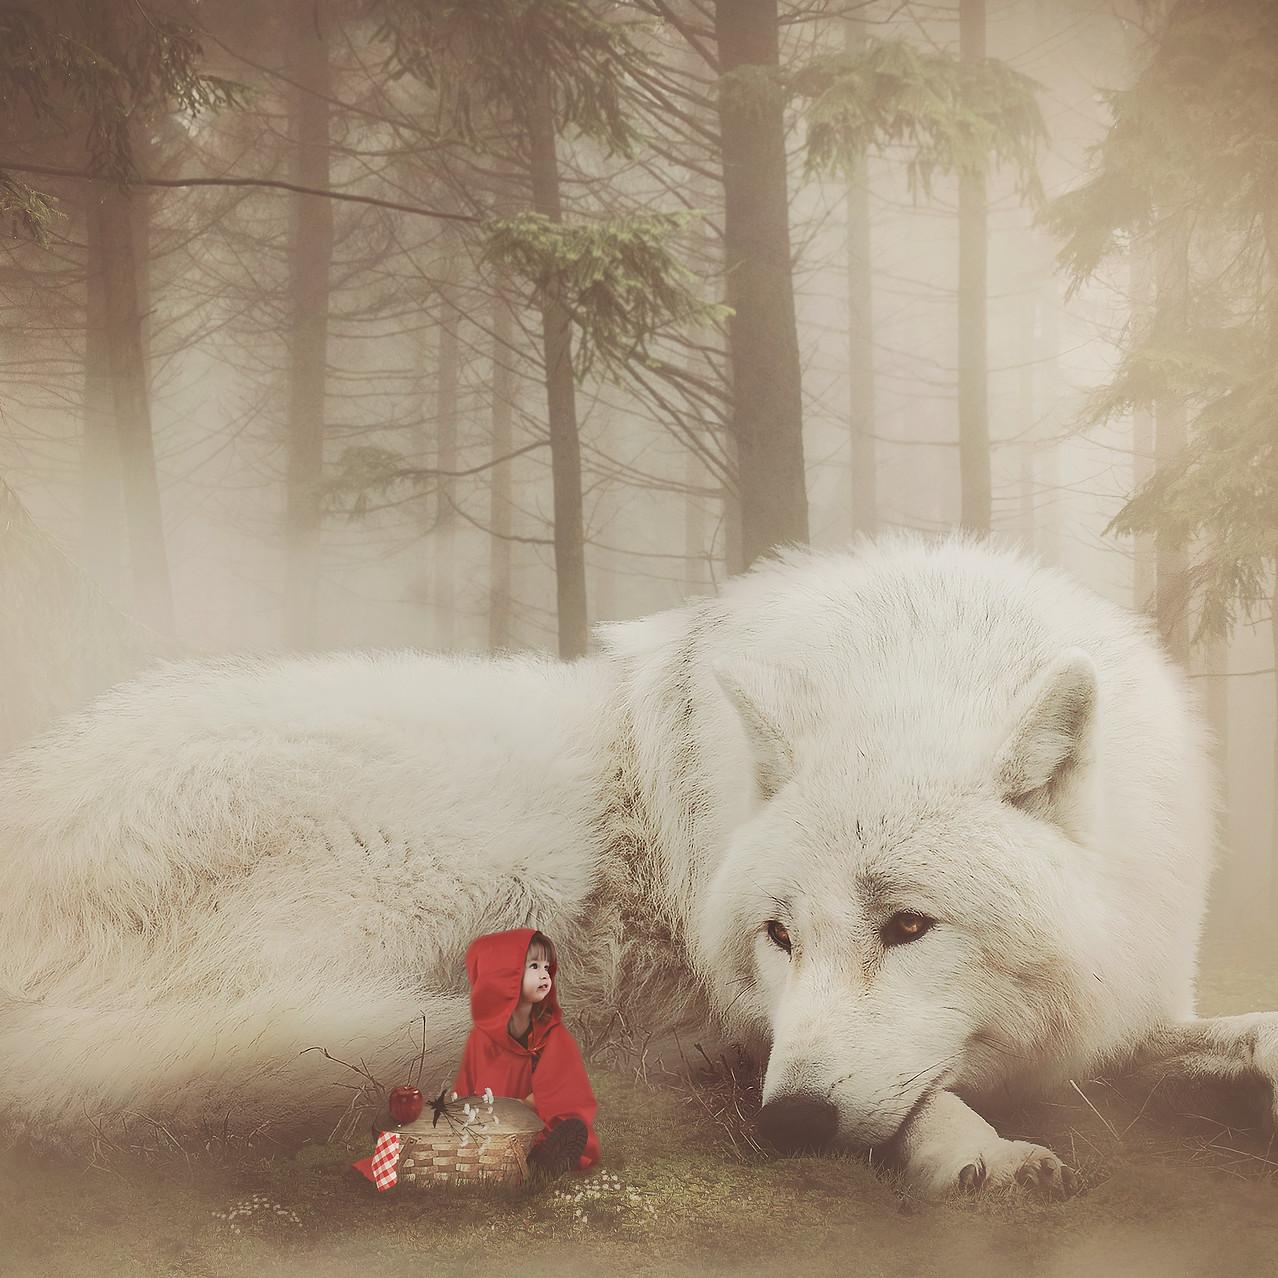 Red Riding hood. Creative Children's Photography fantasy photoshoot, Dream Alice Photography & Art, Gold Coast